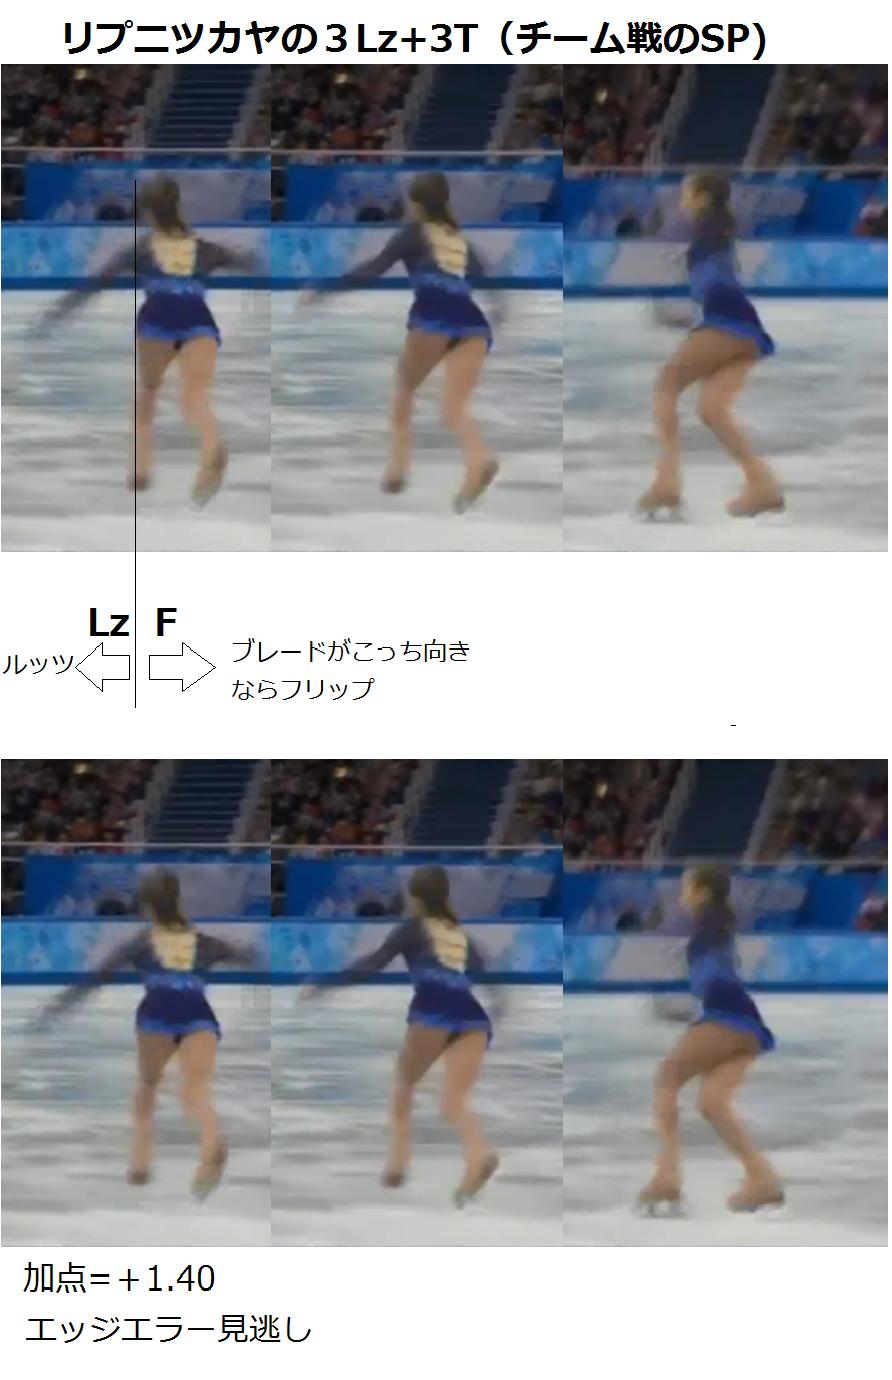 Lipnitskaia-Sochi-Olympics-2014.png